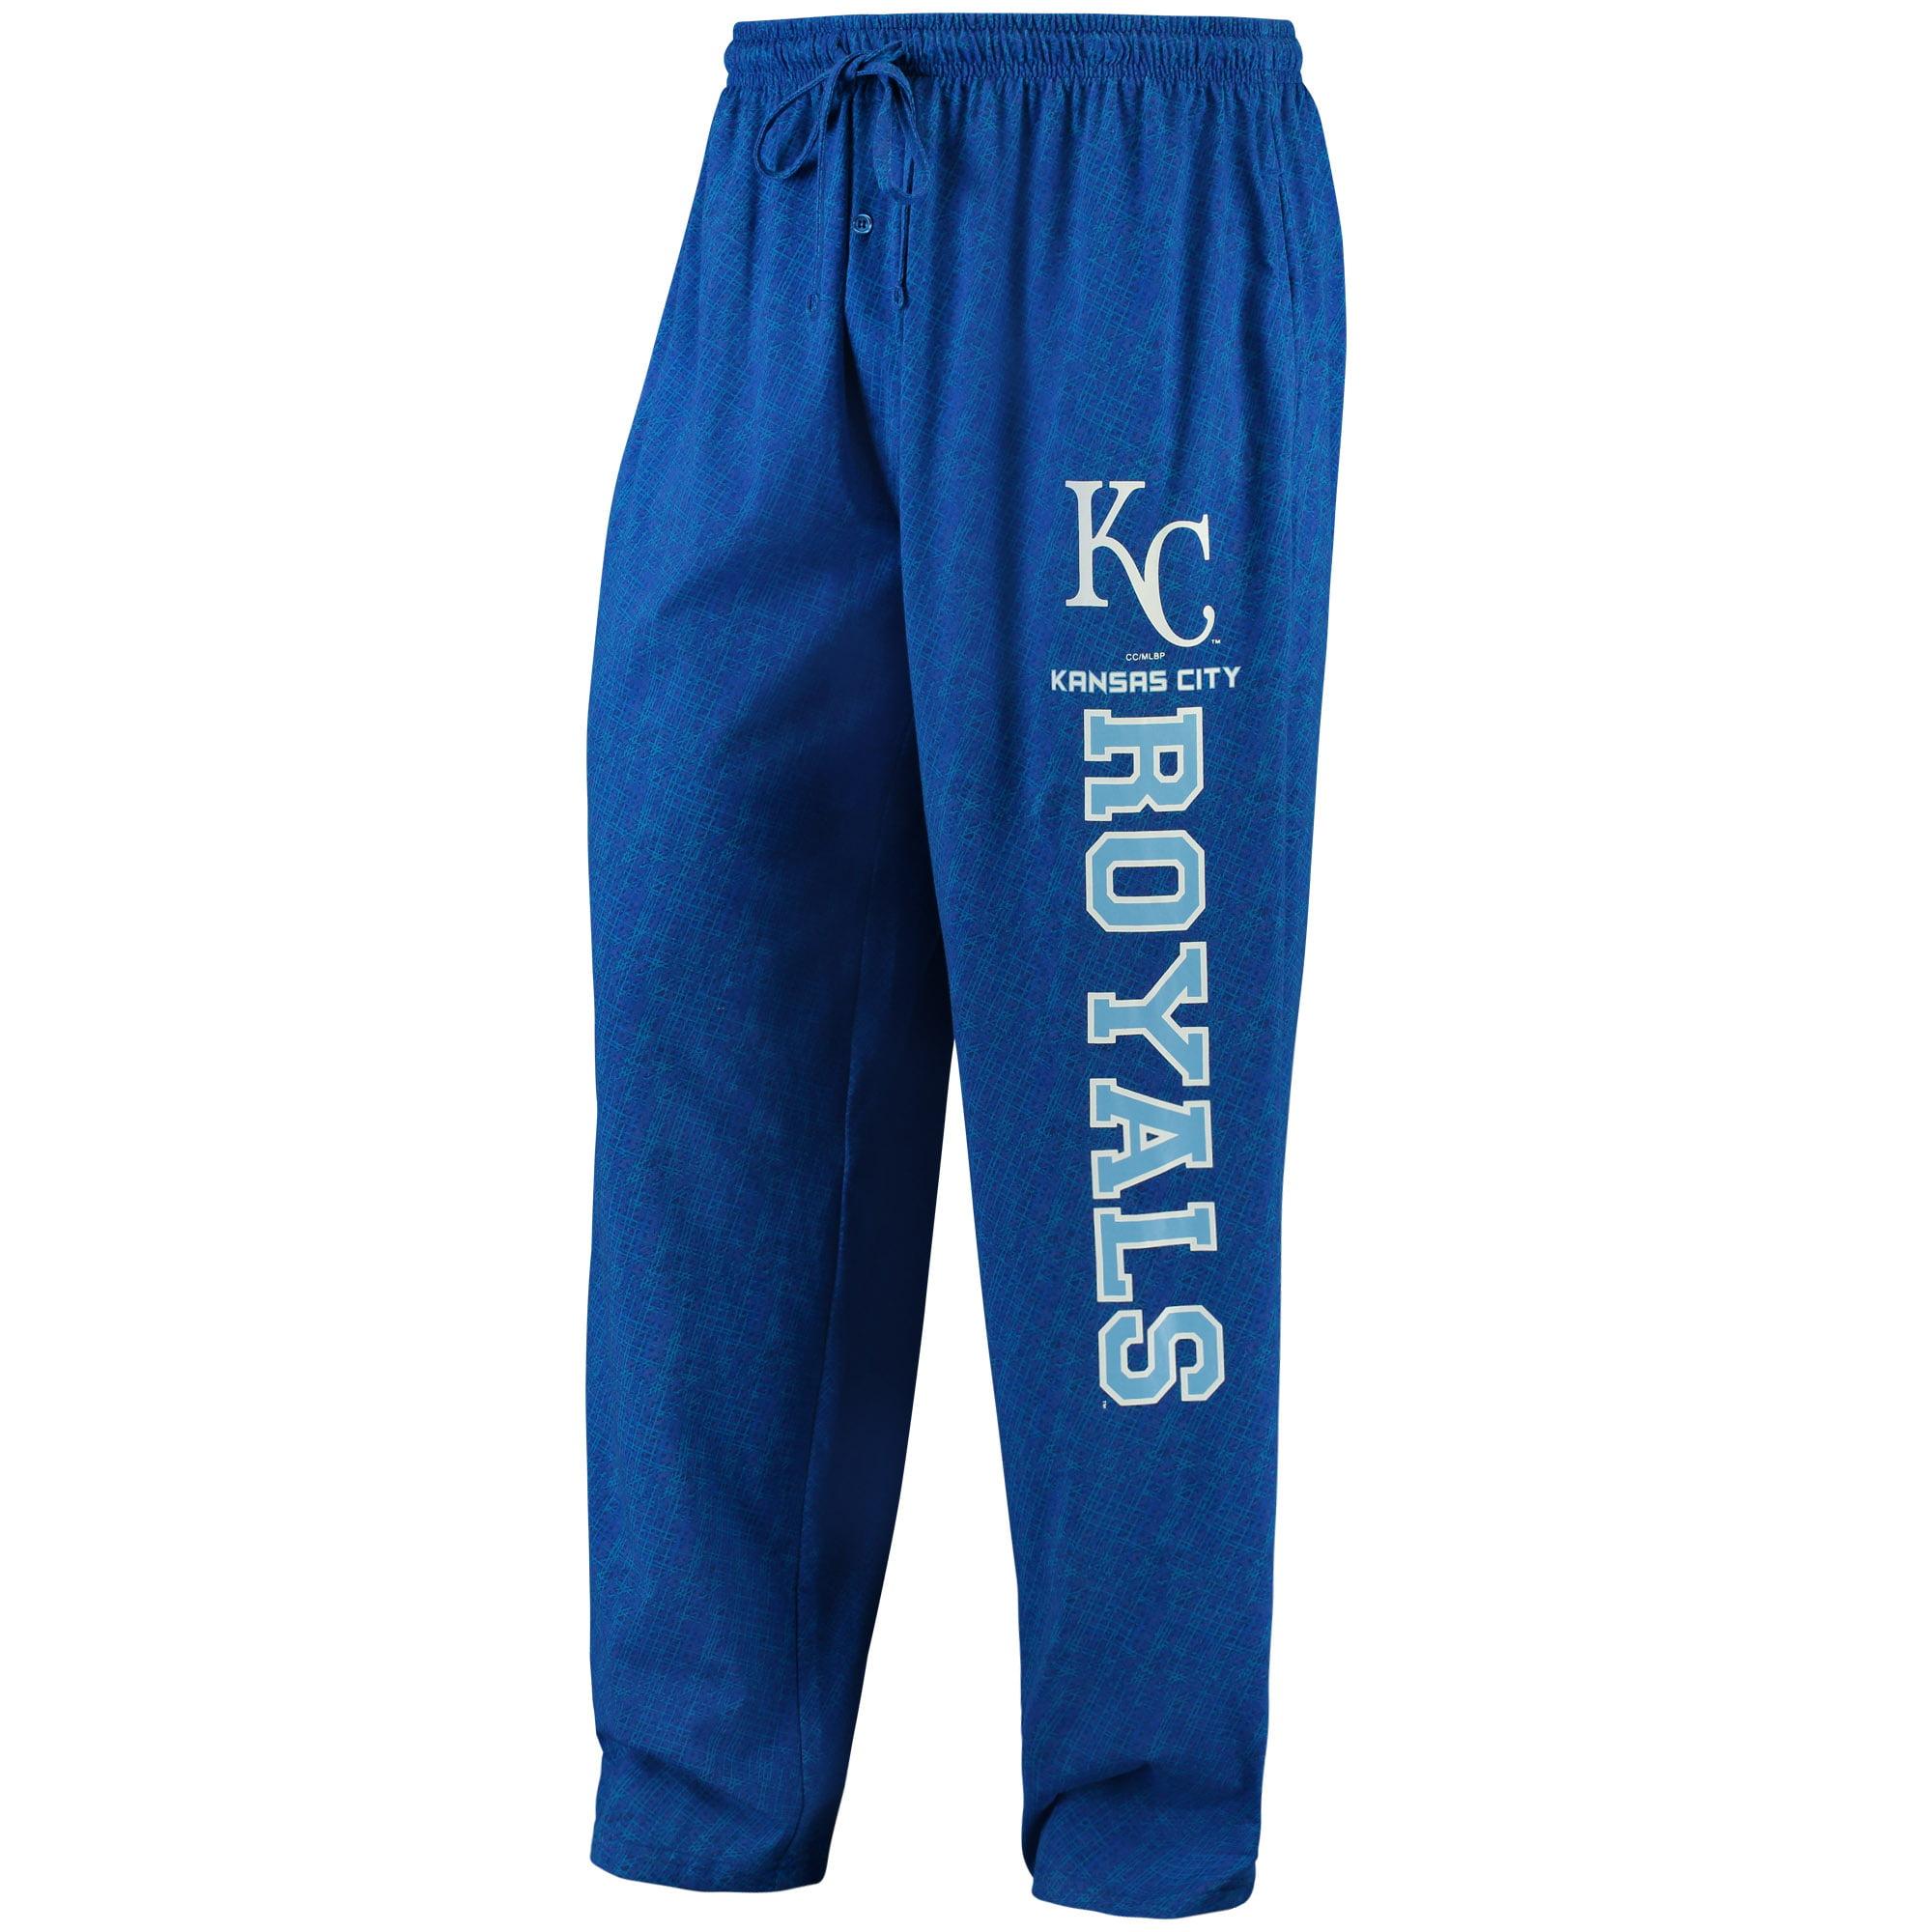 Kansas City Royals Concepts Sport Showdown Knit Pants - Royal